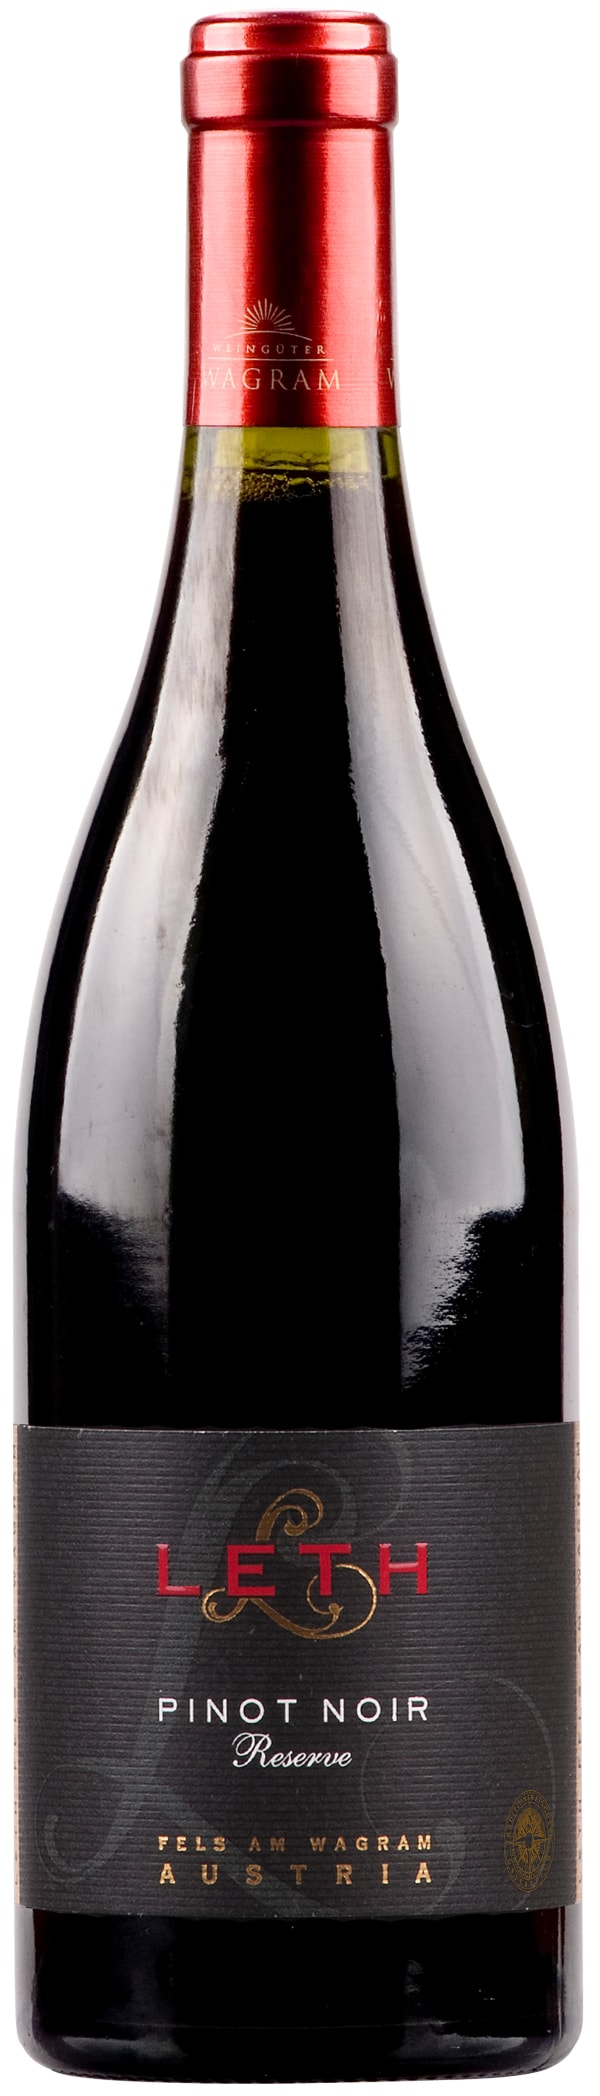 Leth Reserve Pinot Noir 2015